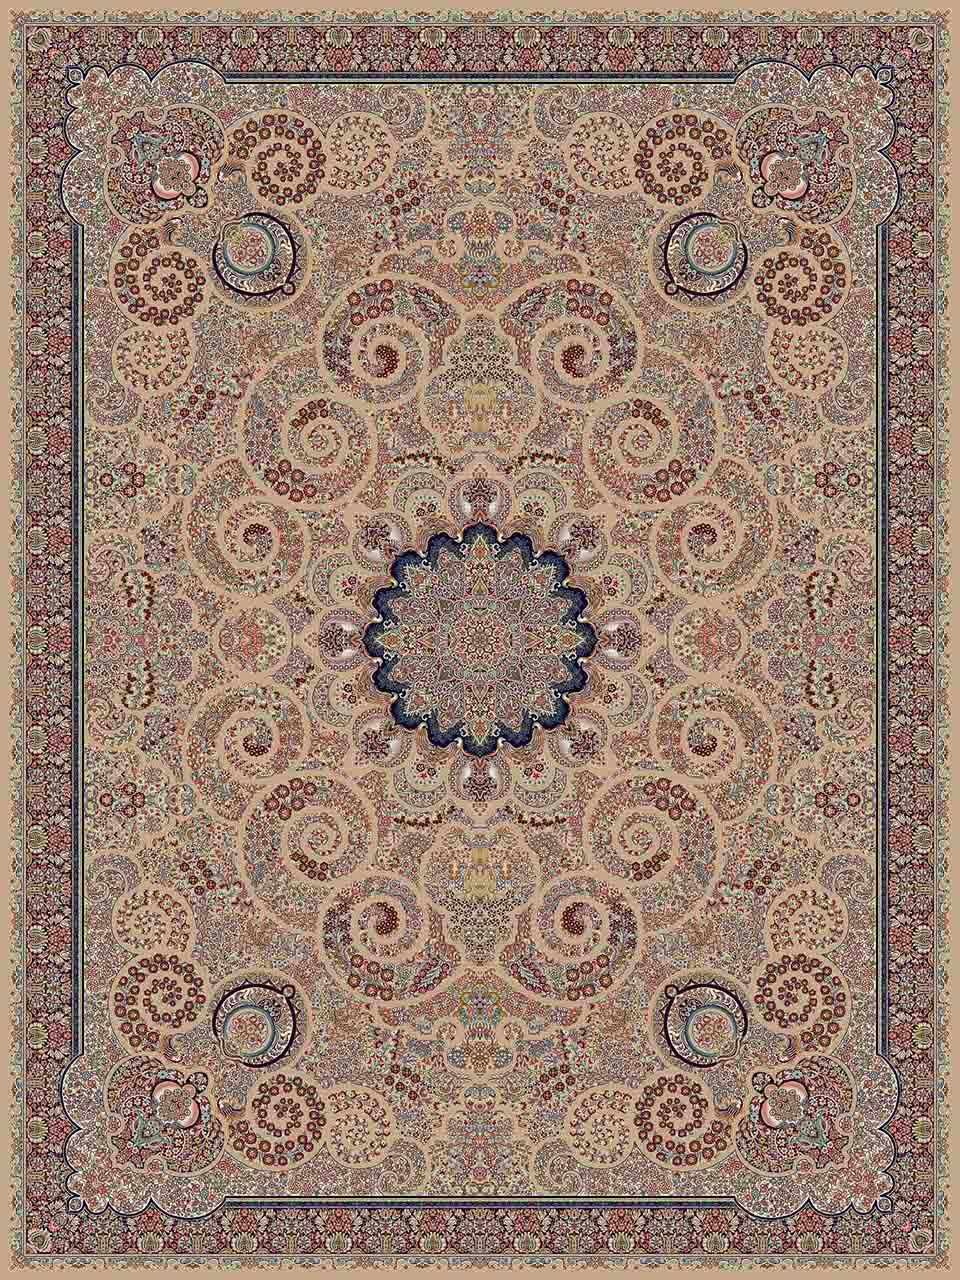 فرش (14067) اکریلیک - 8 رنگ - 700 شانه - گردويي - تراکم 2100